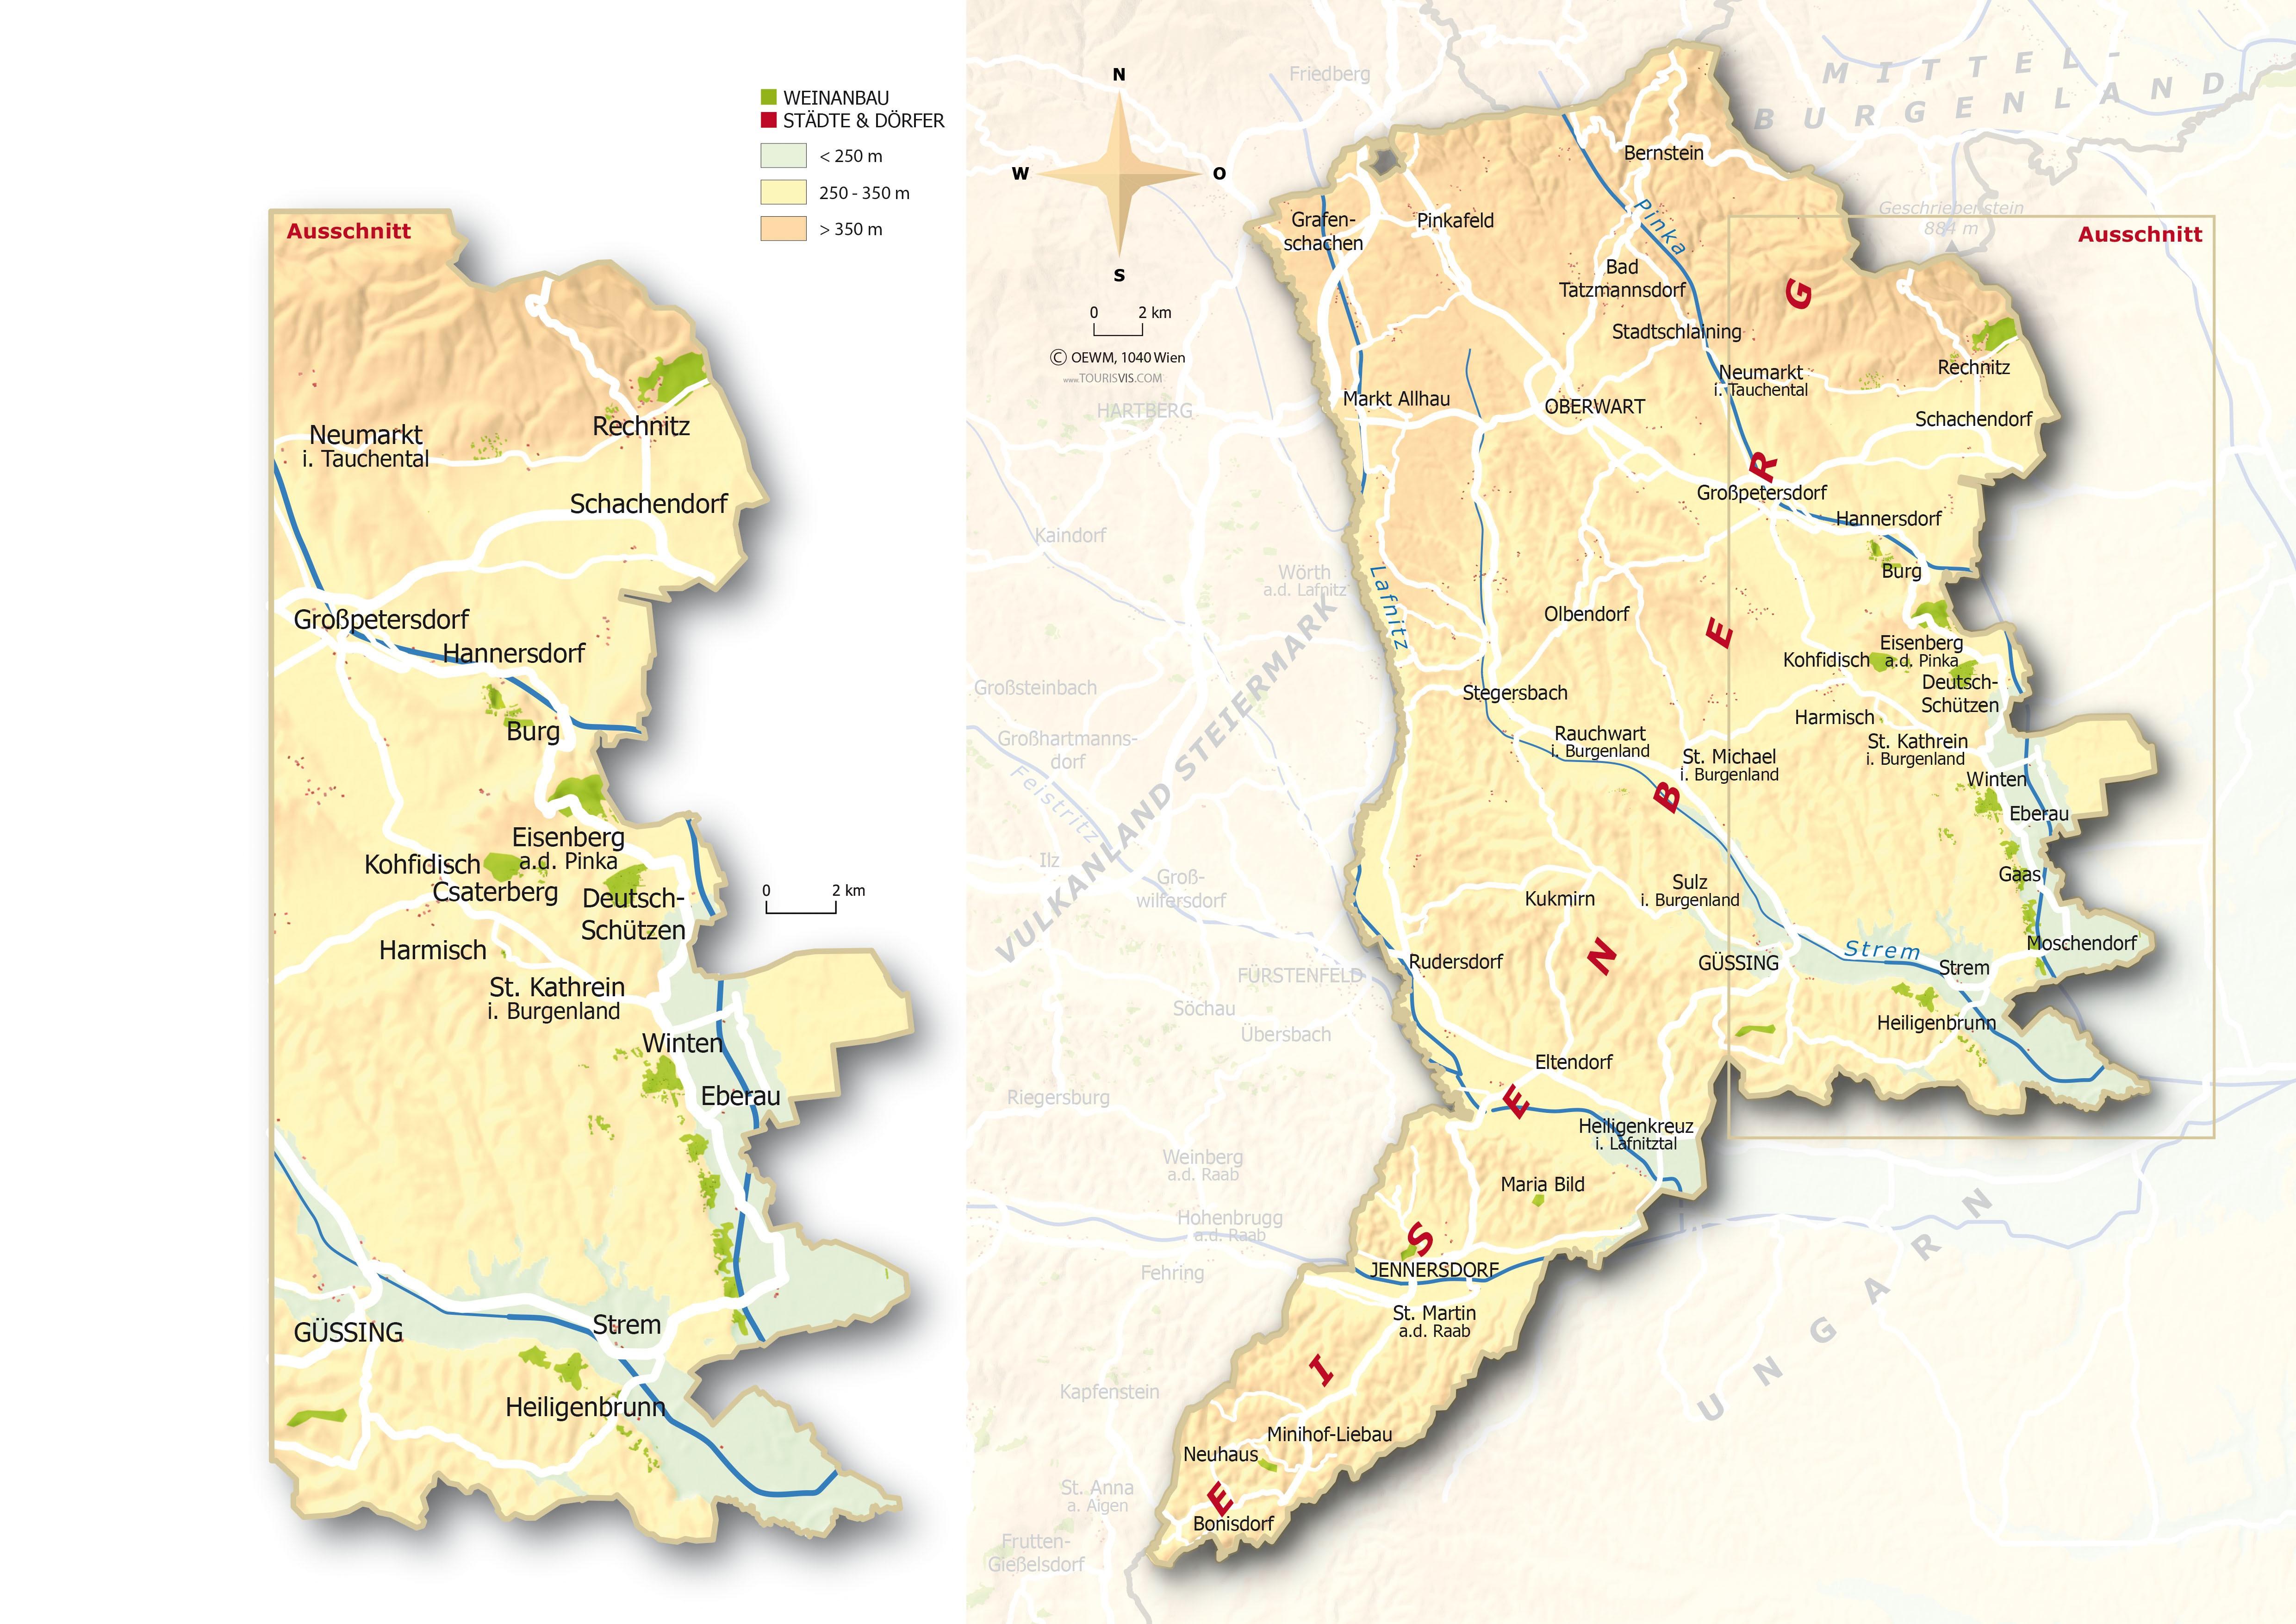 Eisenberg - Map with vineyards